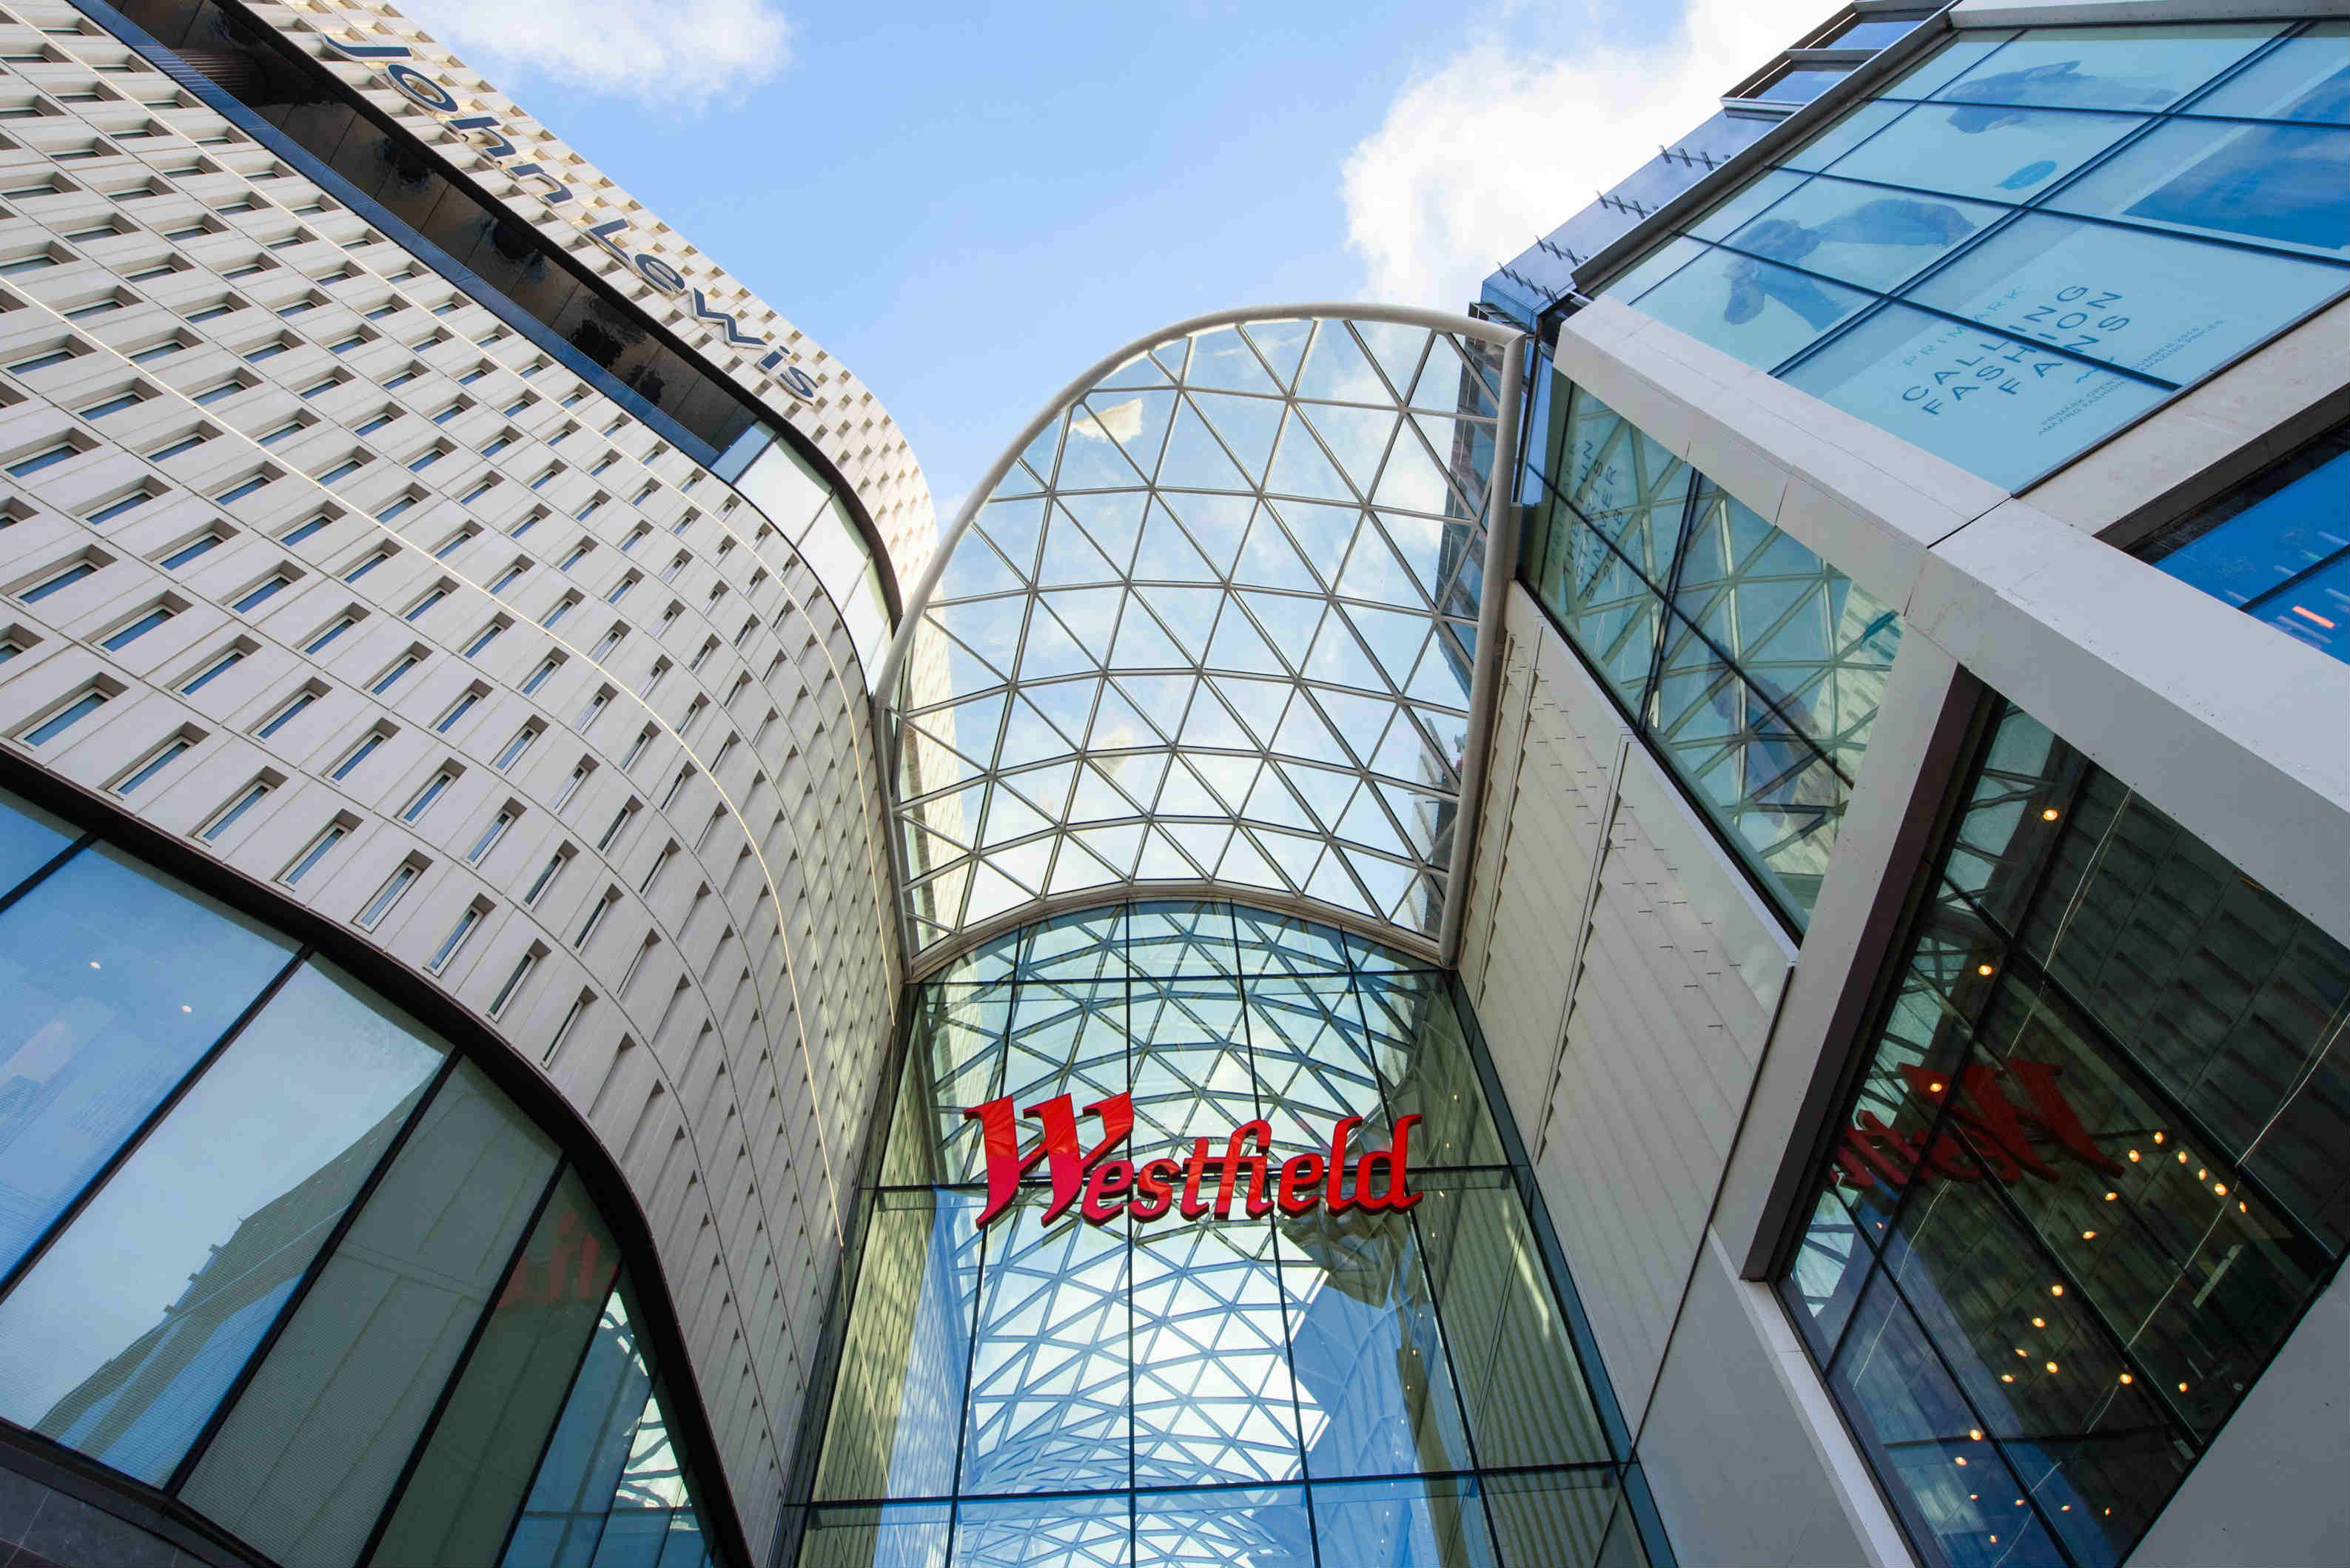 3d signage design – Westfield Shopping Centre